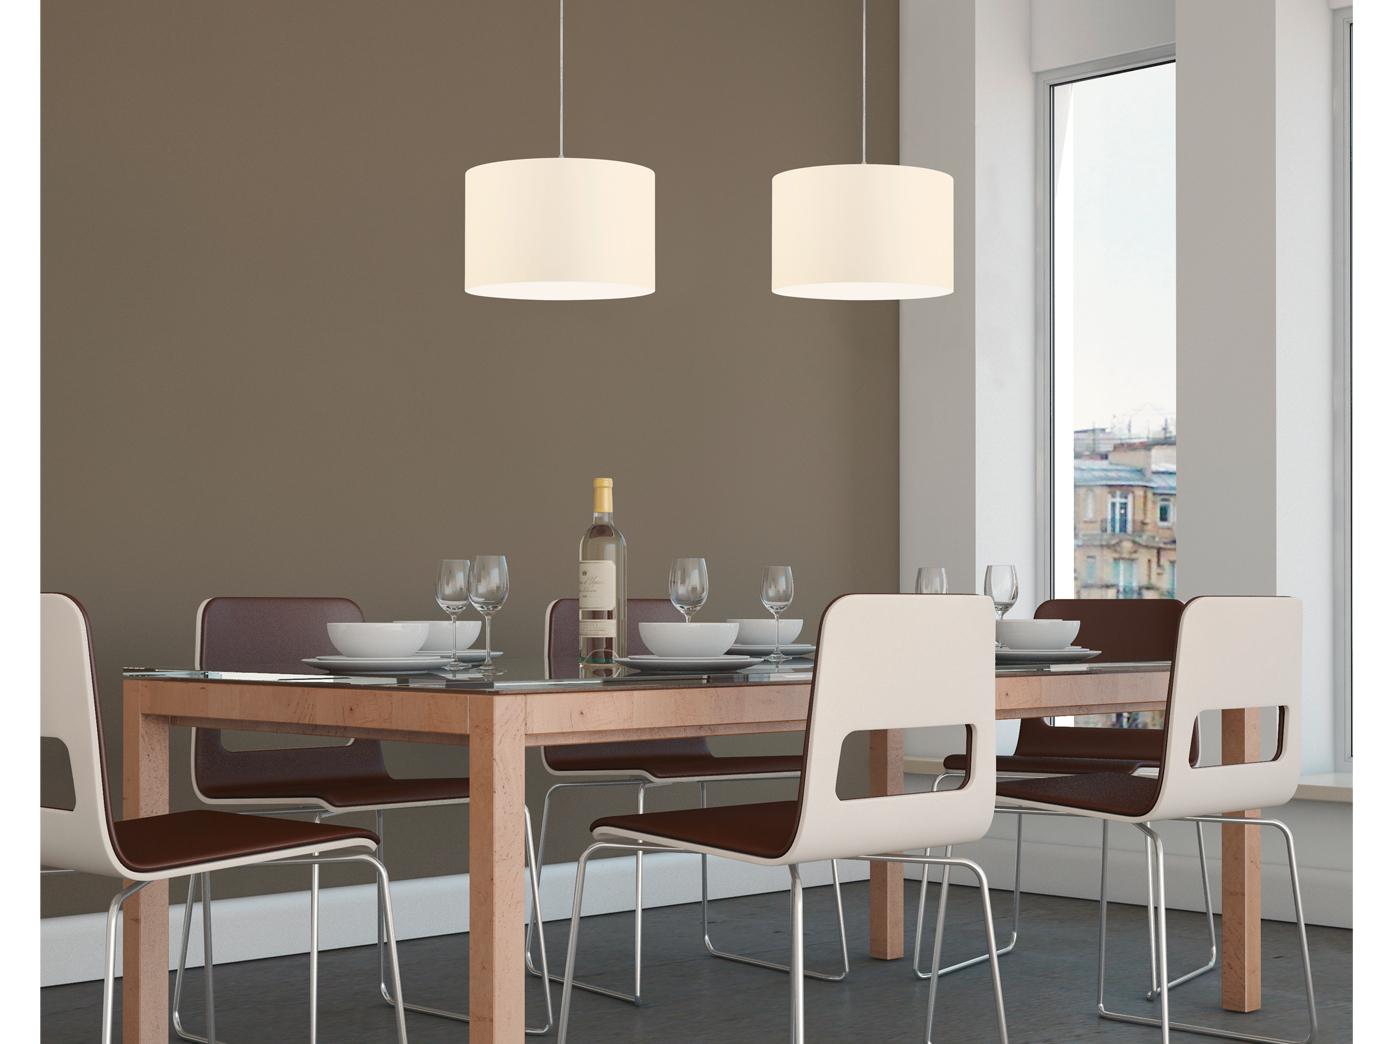 led pendelleuchte mit stoff lampenschirm rund in wei. Black Bedroom Furniture Sets. Home Design Ideas